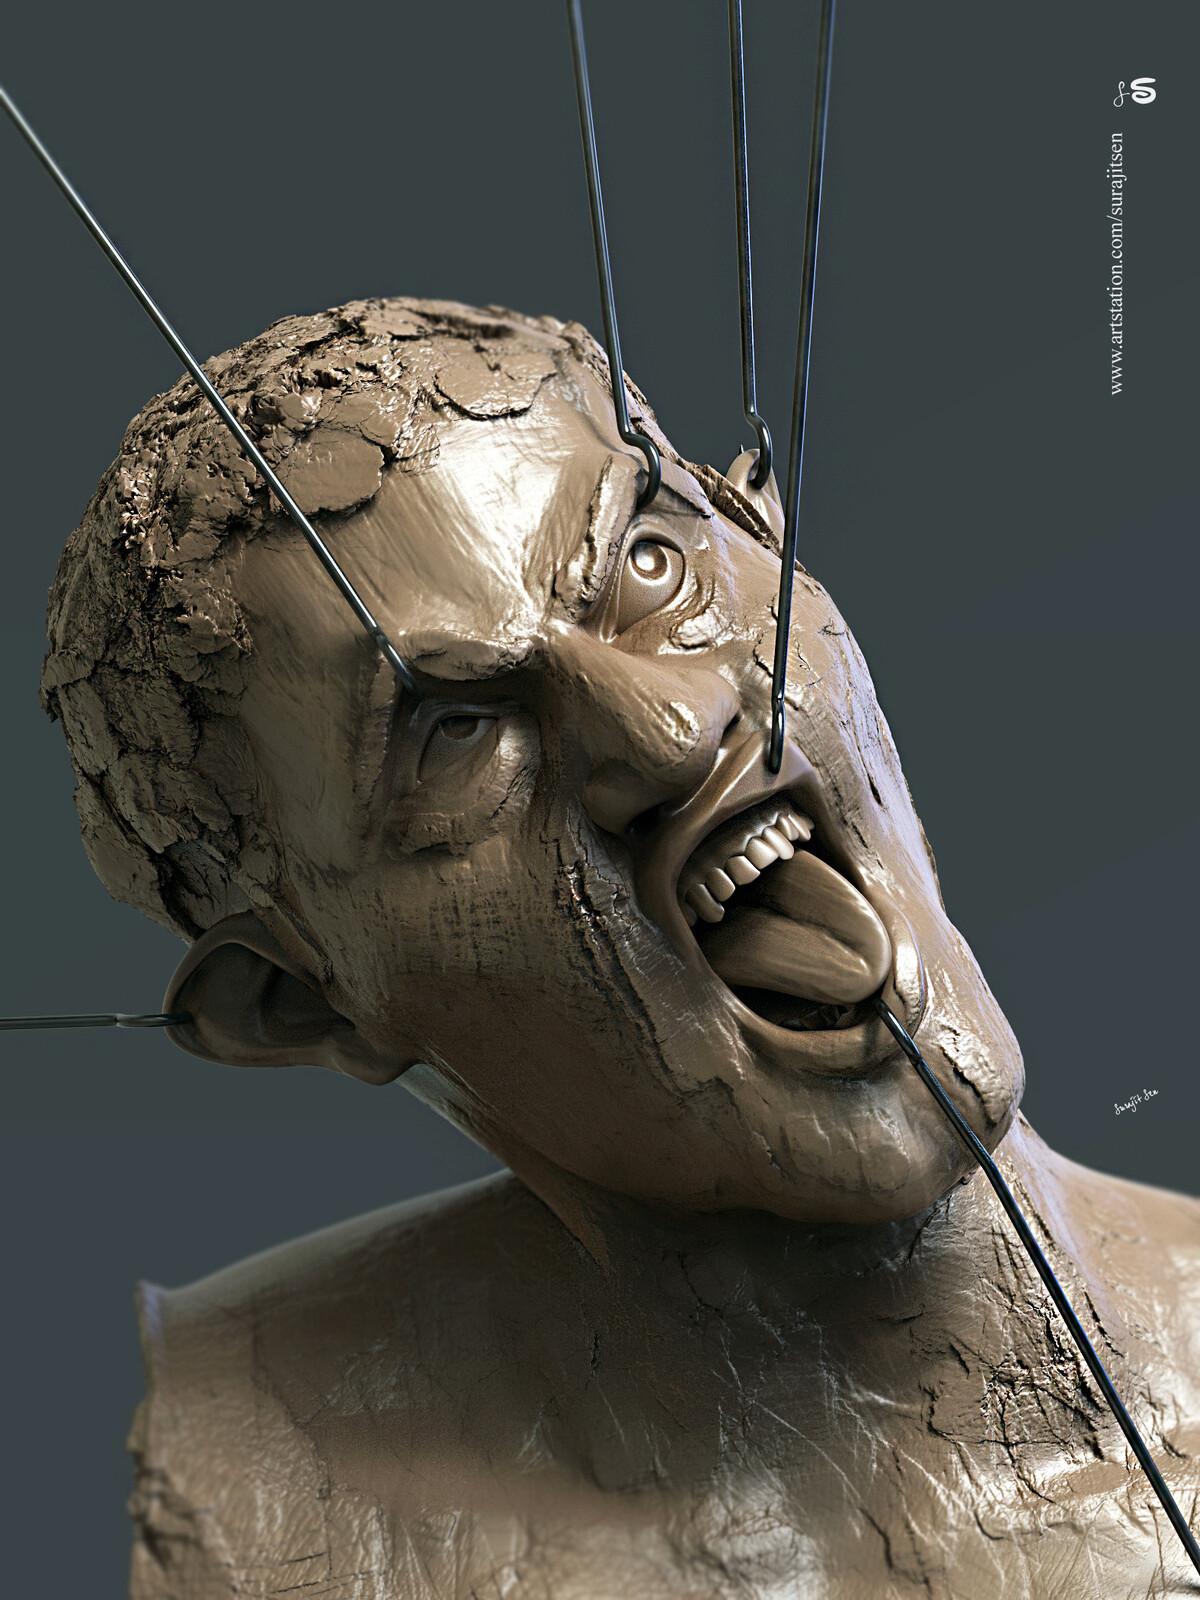 """Pain"" My free time speed Digital sculpt study!  Background music - #hanszimmermusic"